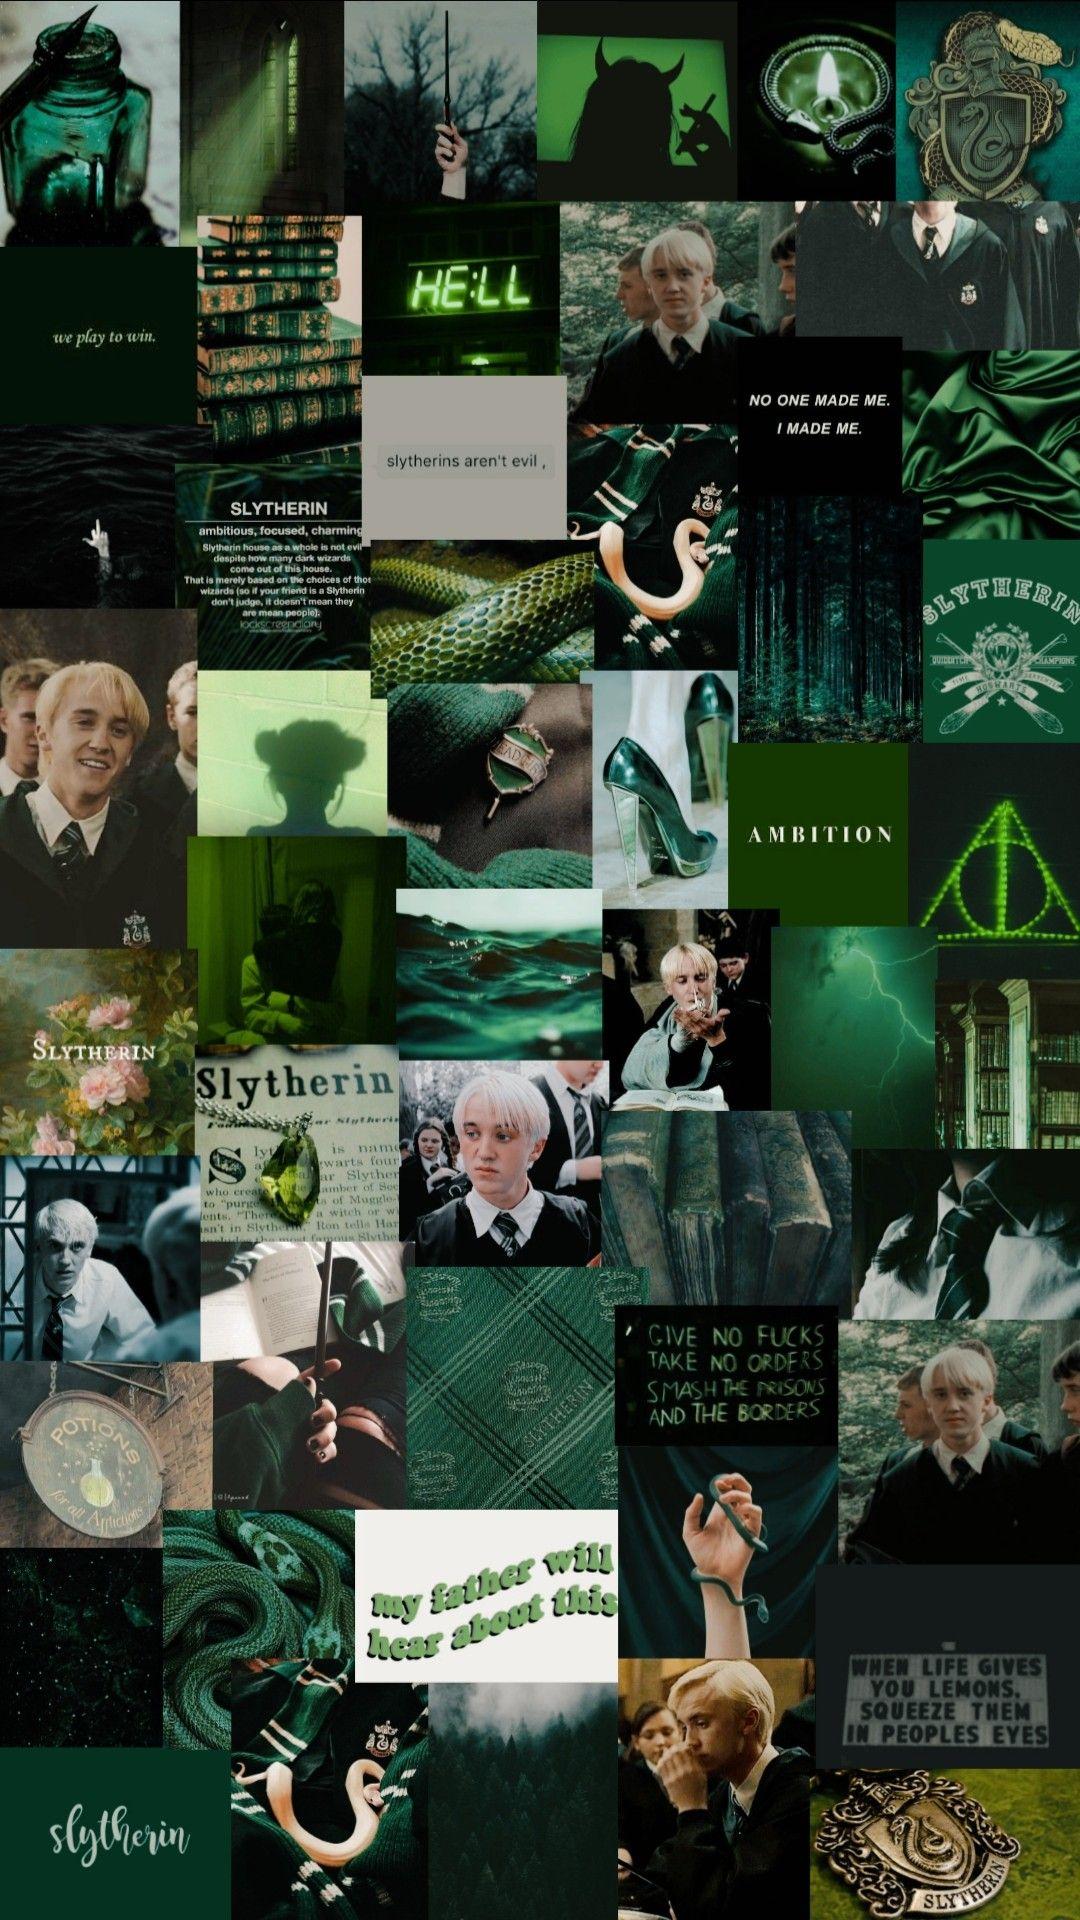 Slytherin Wallpaper Slytherin Wallpaper Slytherin Harry Potter Wallpaper